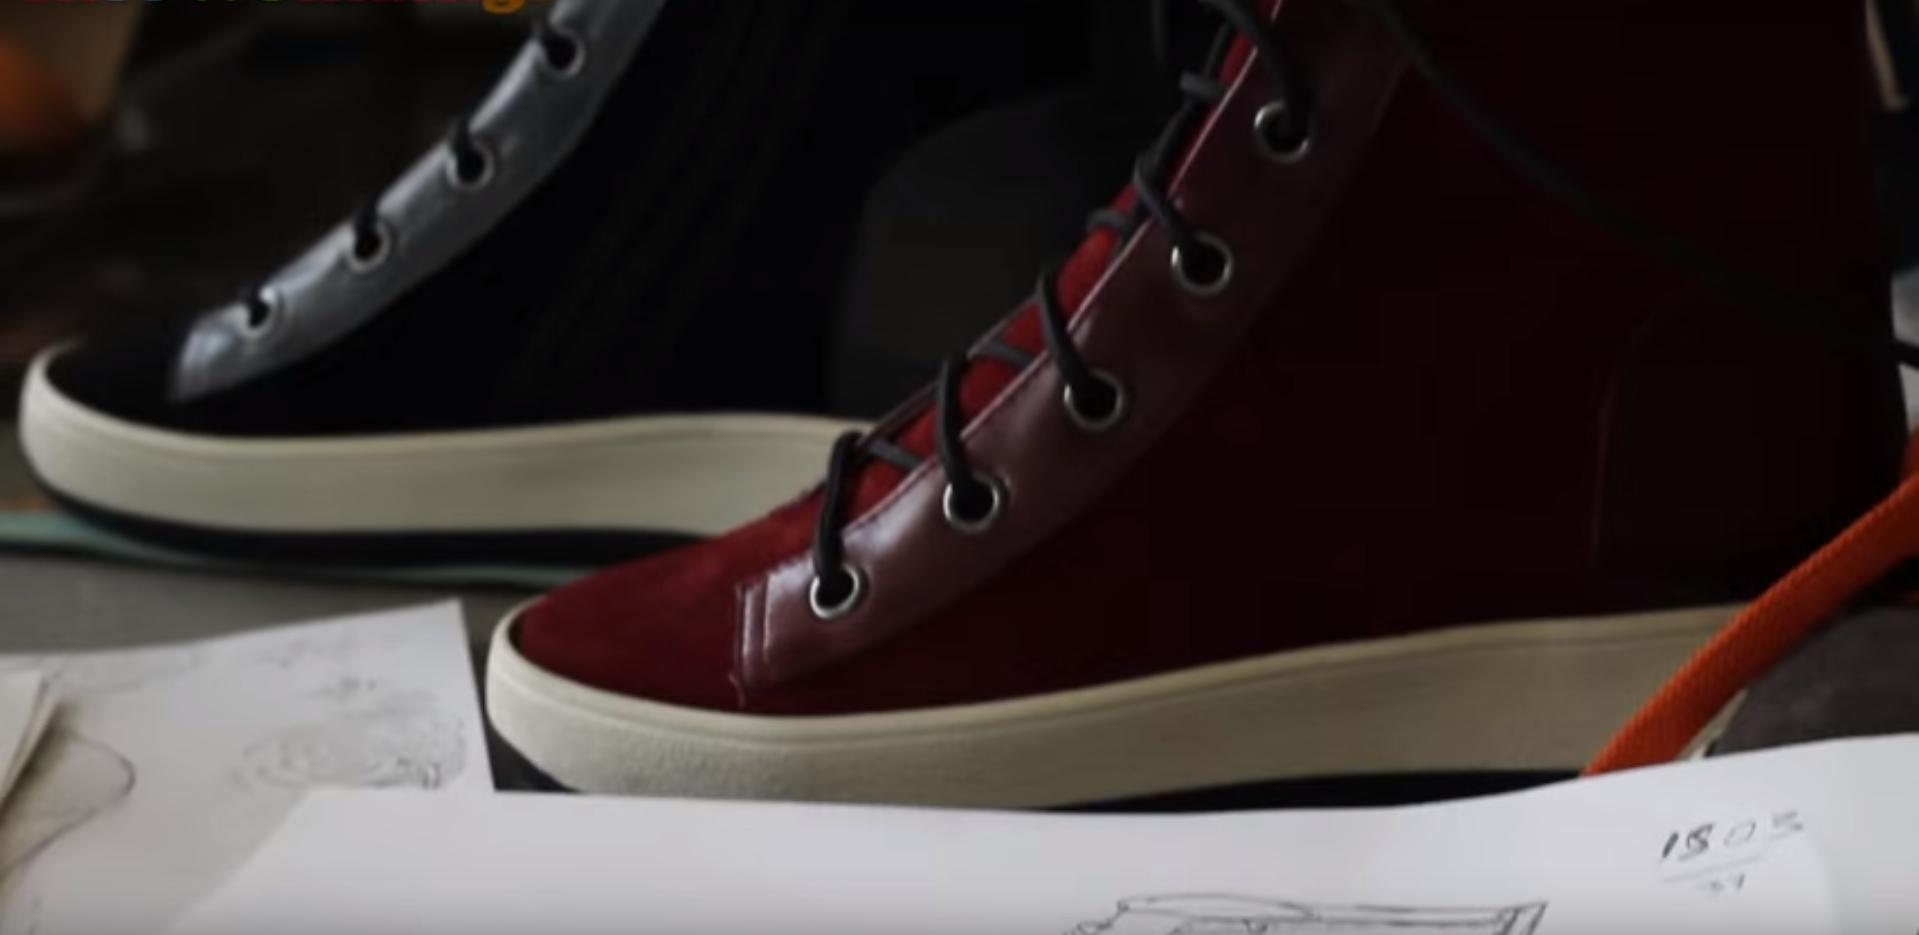 26cc4a92aca Ψάχνουμε, βρίσκουμε, μαθαίνουμε: Πώς φτιάχνεται ένα καλό παπούτσι ...